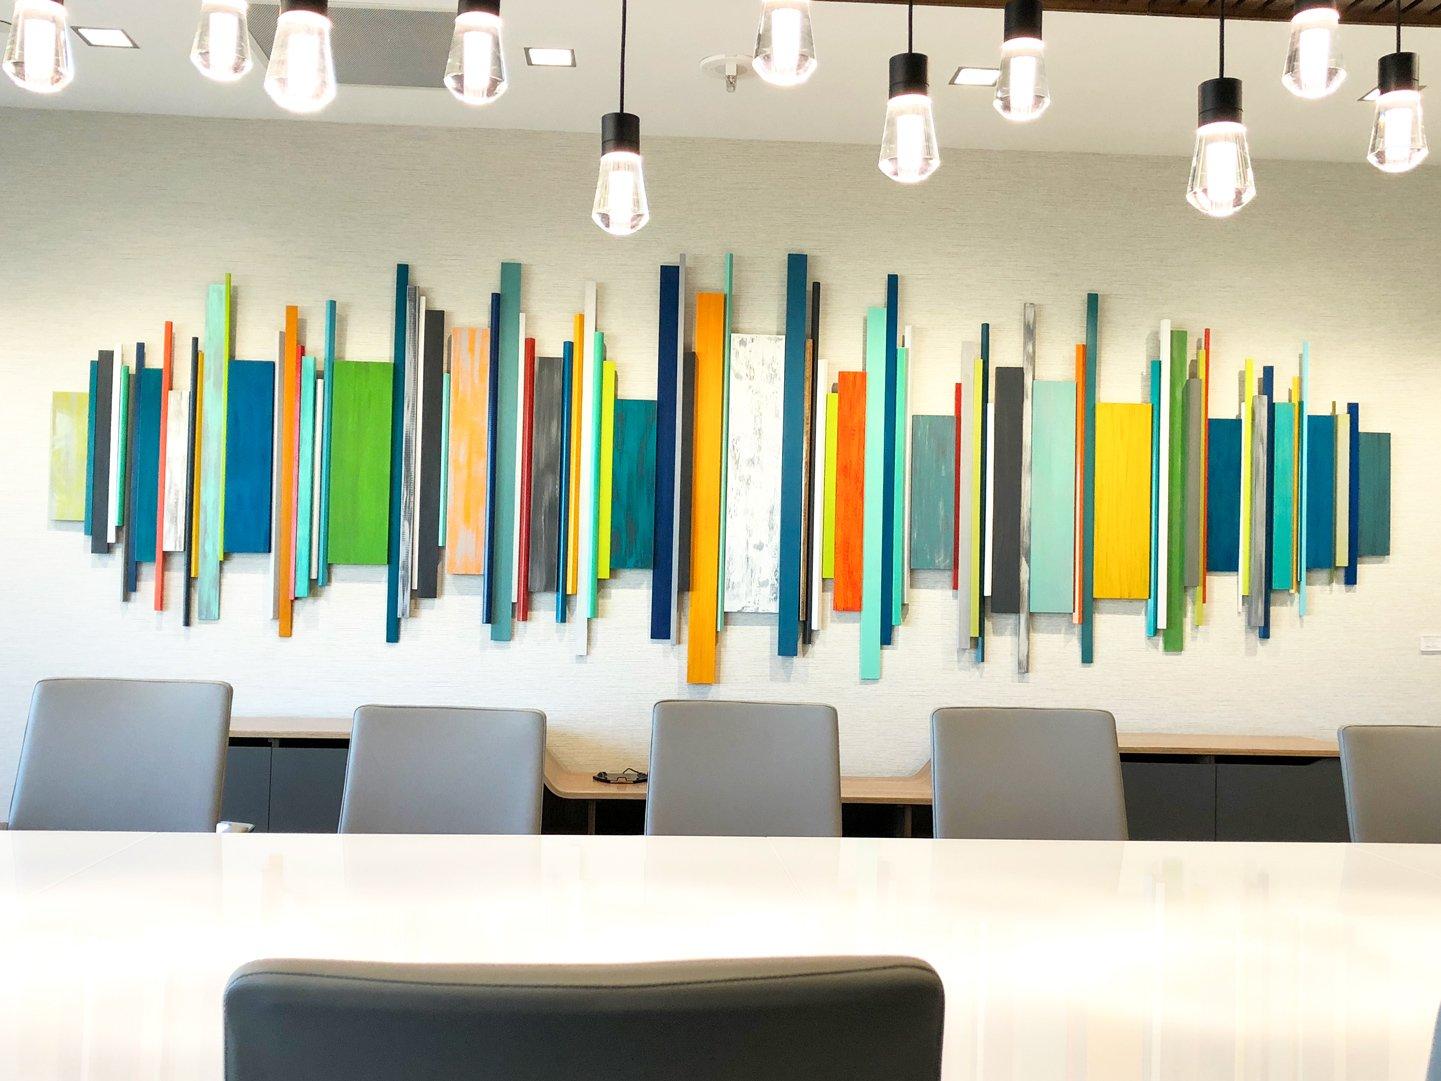 office wall decor. Exellent Wall Image Of Corporate Artwork  Office Wall Decor Wood Art Modern  Sculpture  Inside S